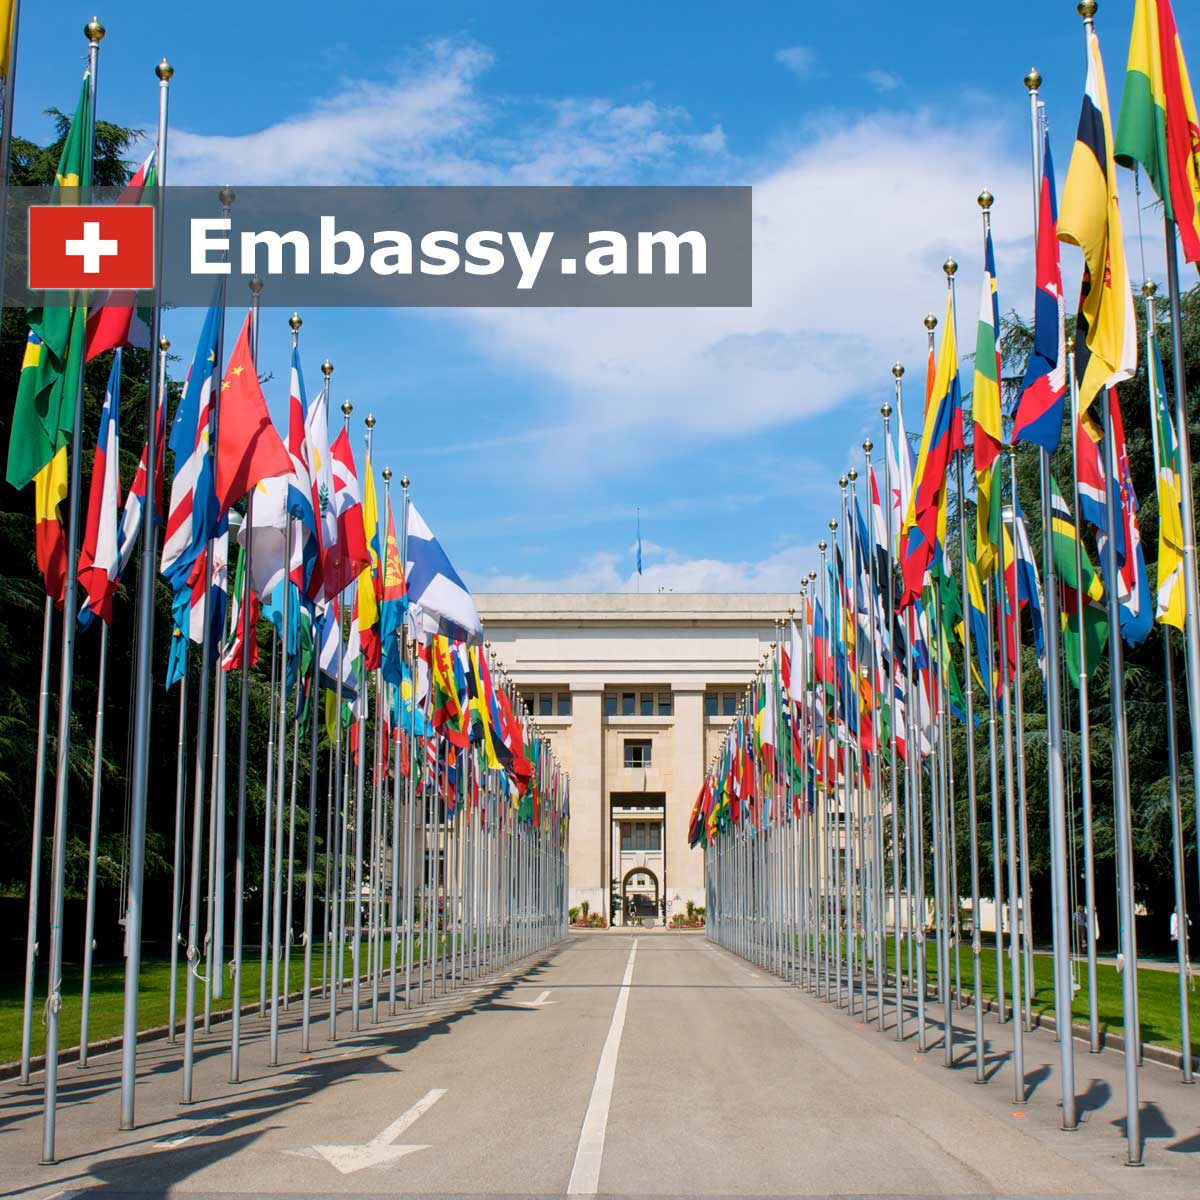 Geneva - Hotels in Switzerland - Embassy.am